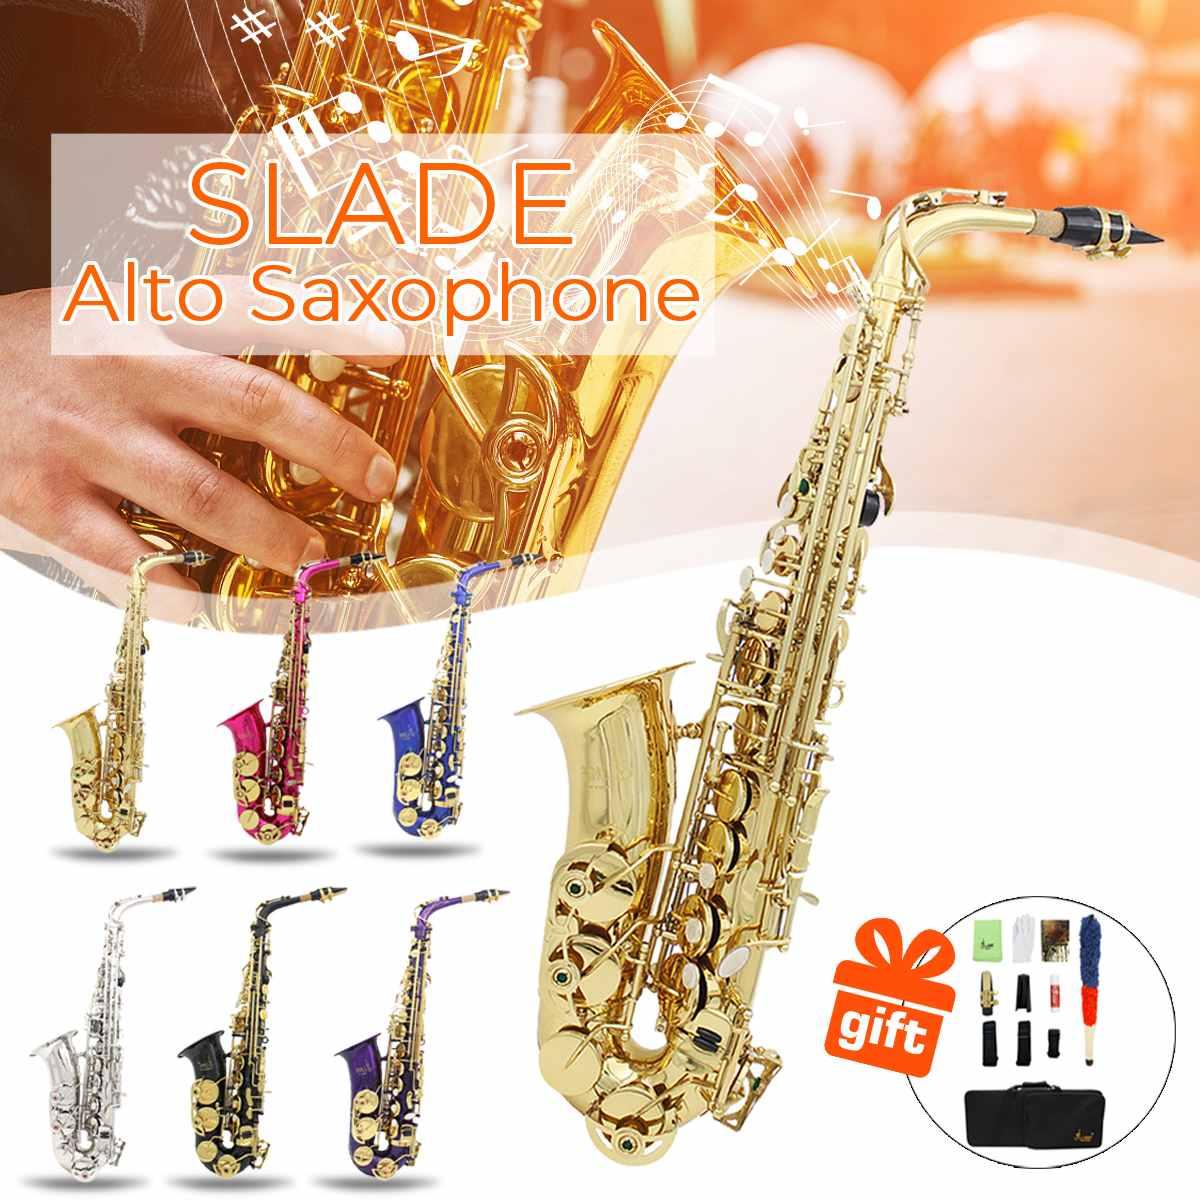 Instrumento de Orquestra Trompete com Bolsa de Transporte Slade Conjunto Saxofone Alto Apartamento Requintado Sax Aumento Acolchoada eb